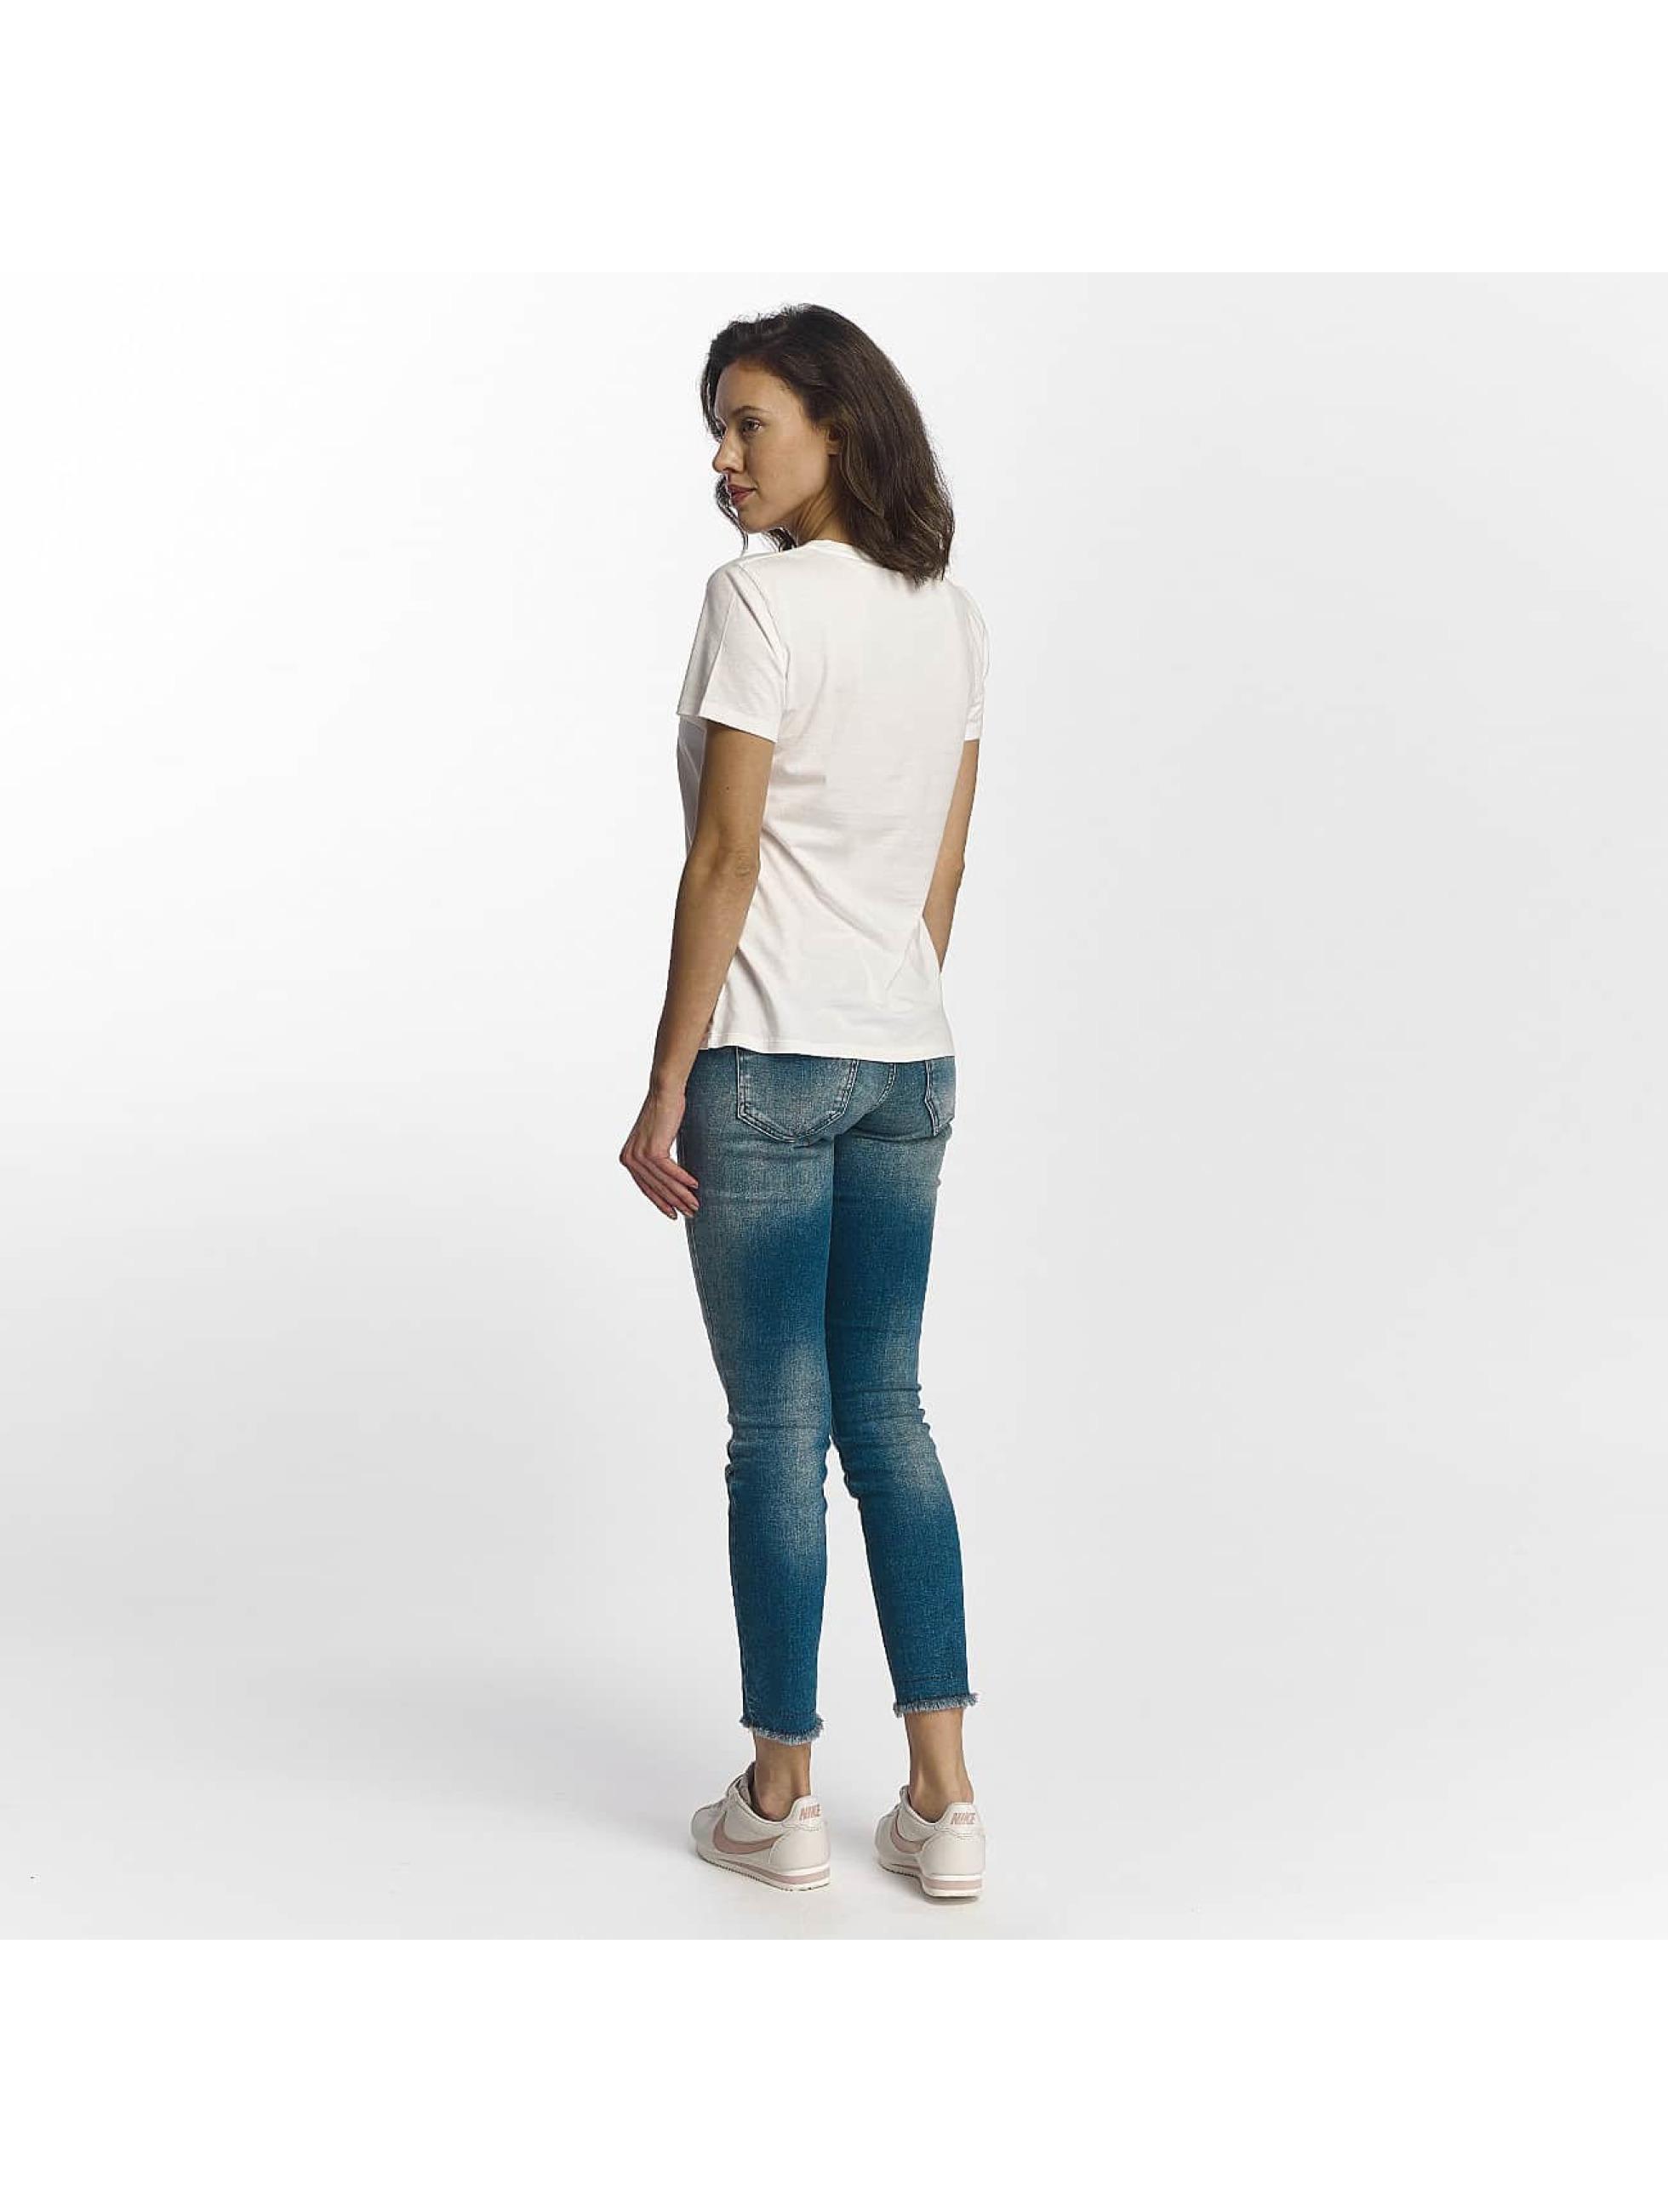 Levi's® t-shirt Retro 501 wit